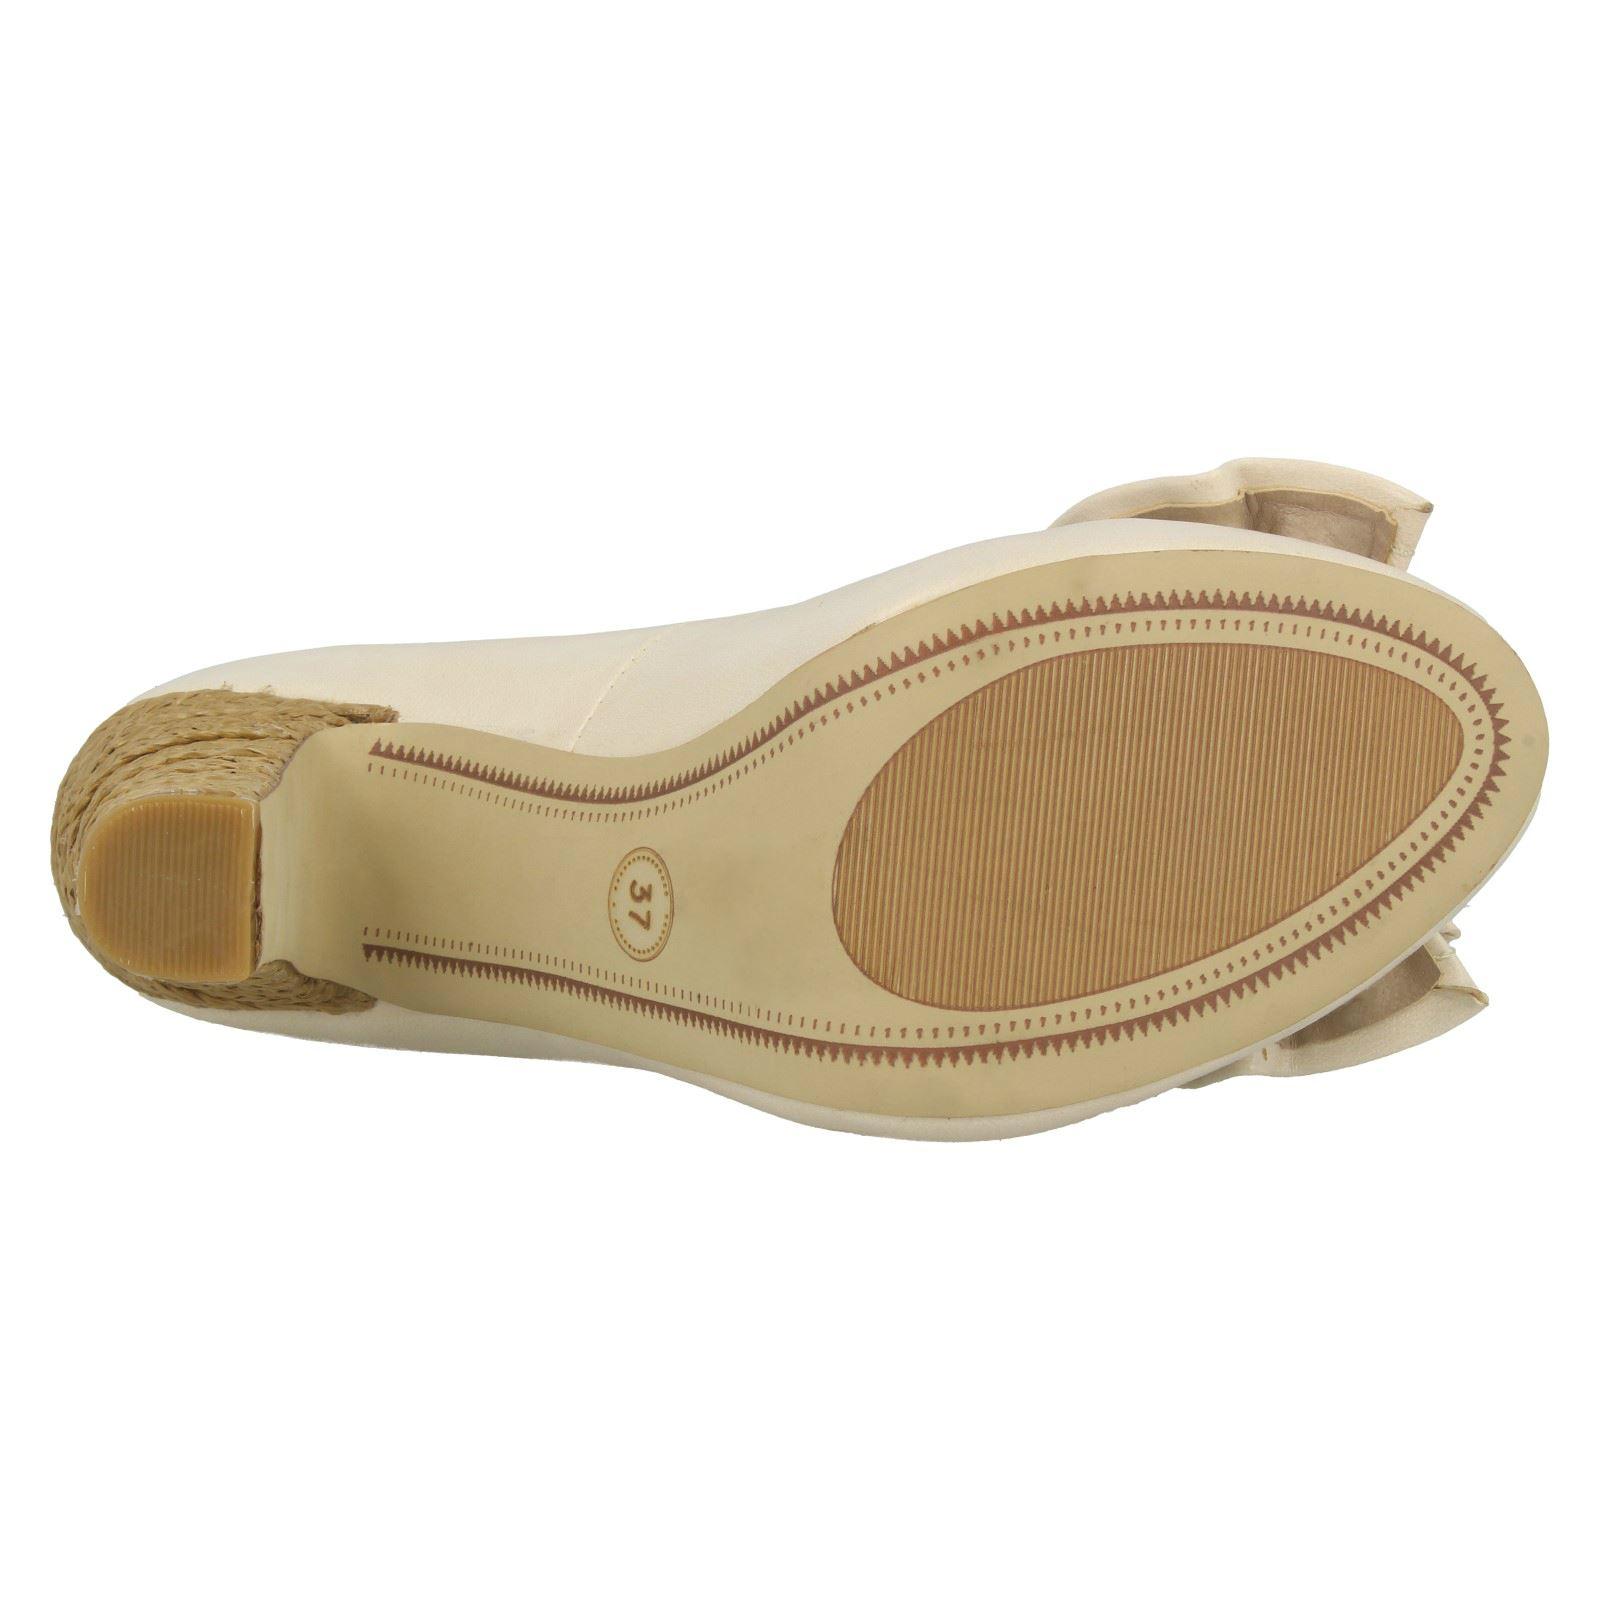 Señoras Barricci Tribunal Zapatos con diseño de arco F9532